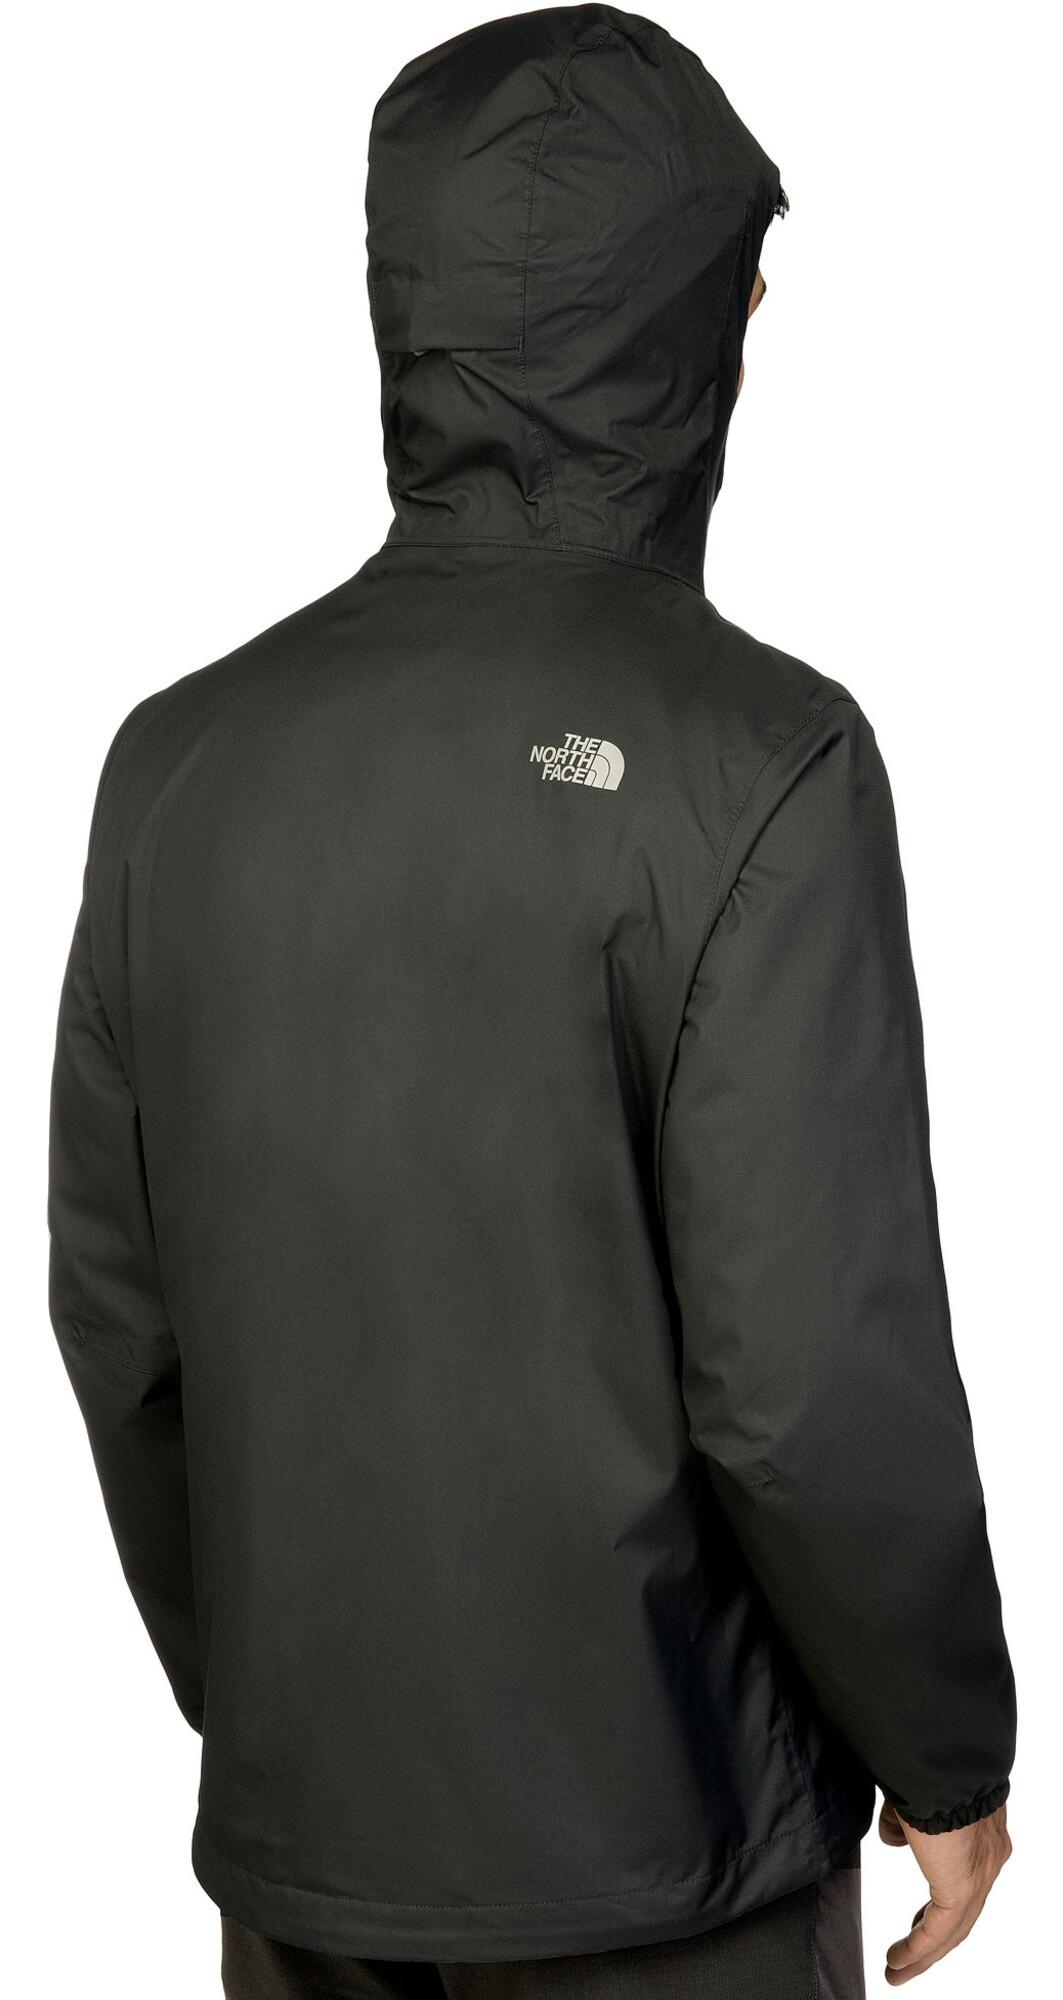 sale retailer a941b 11e5f The North Face Quest Jacket Herren tnf black